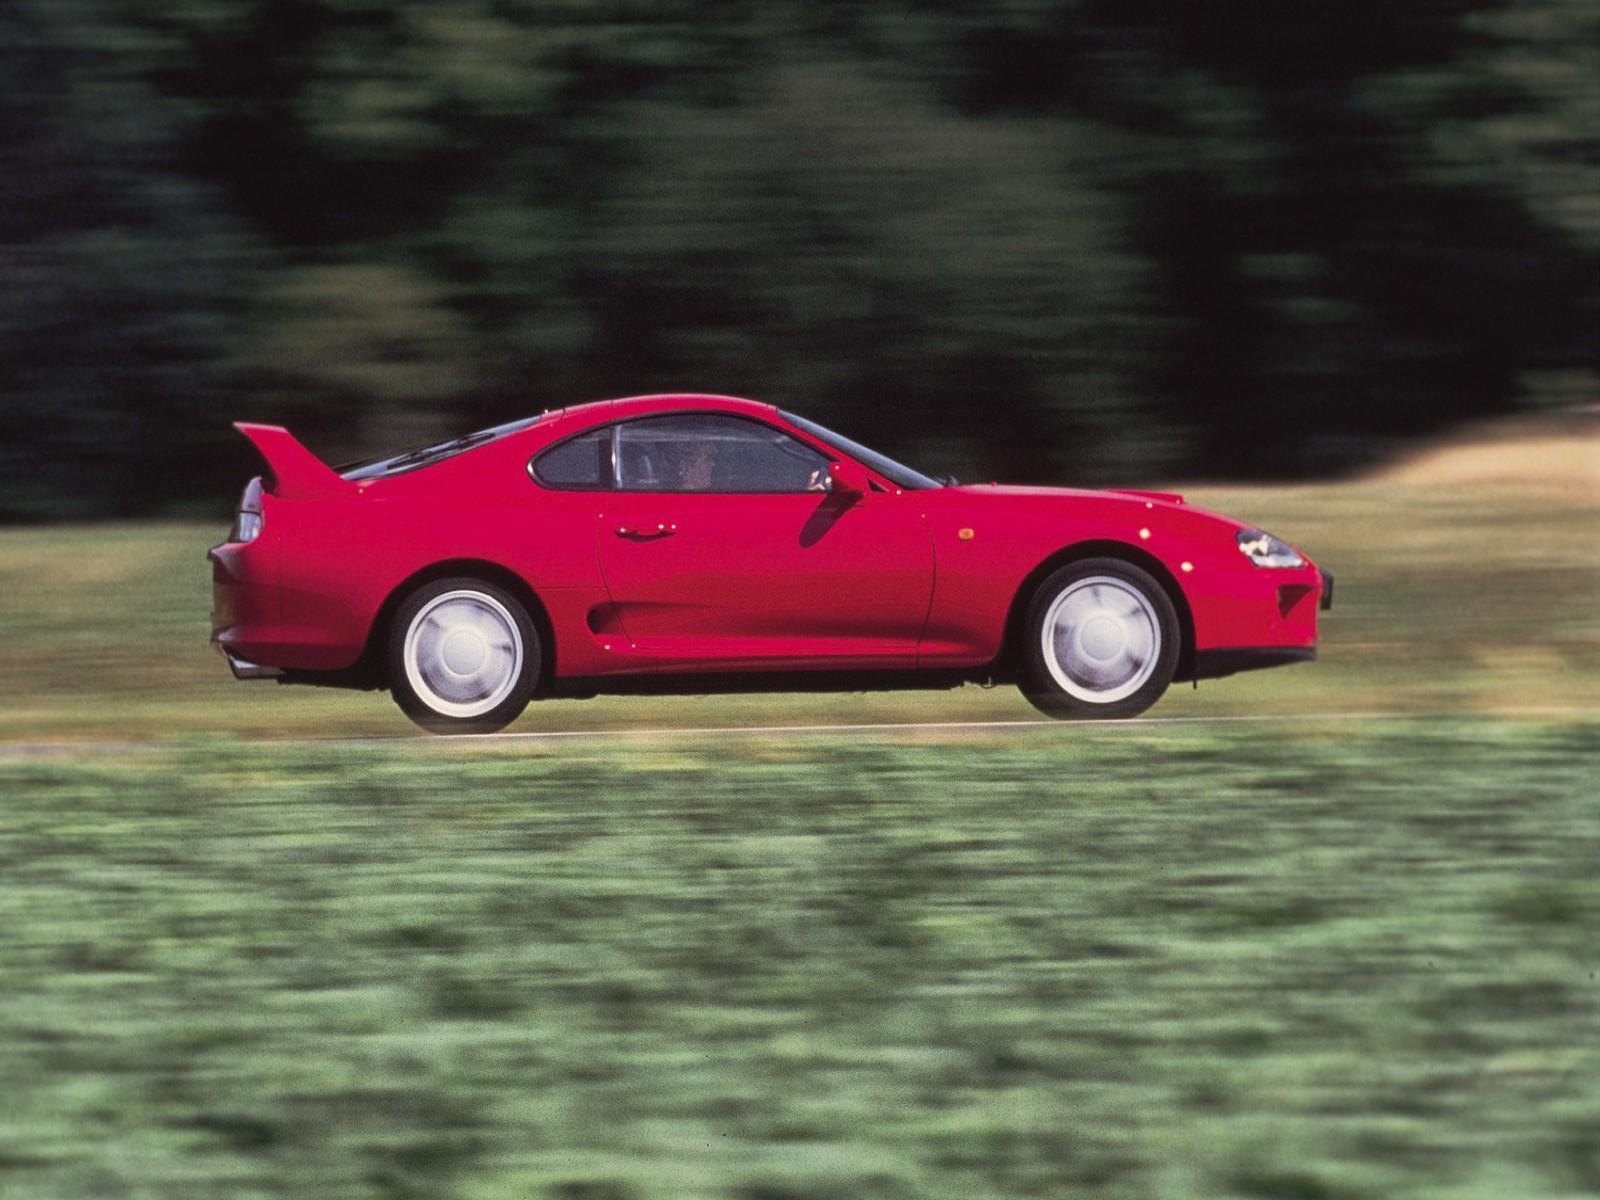 1996-toyota-supra-1600x1200-image-7